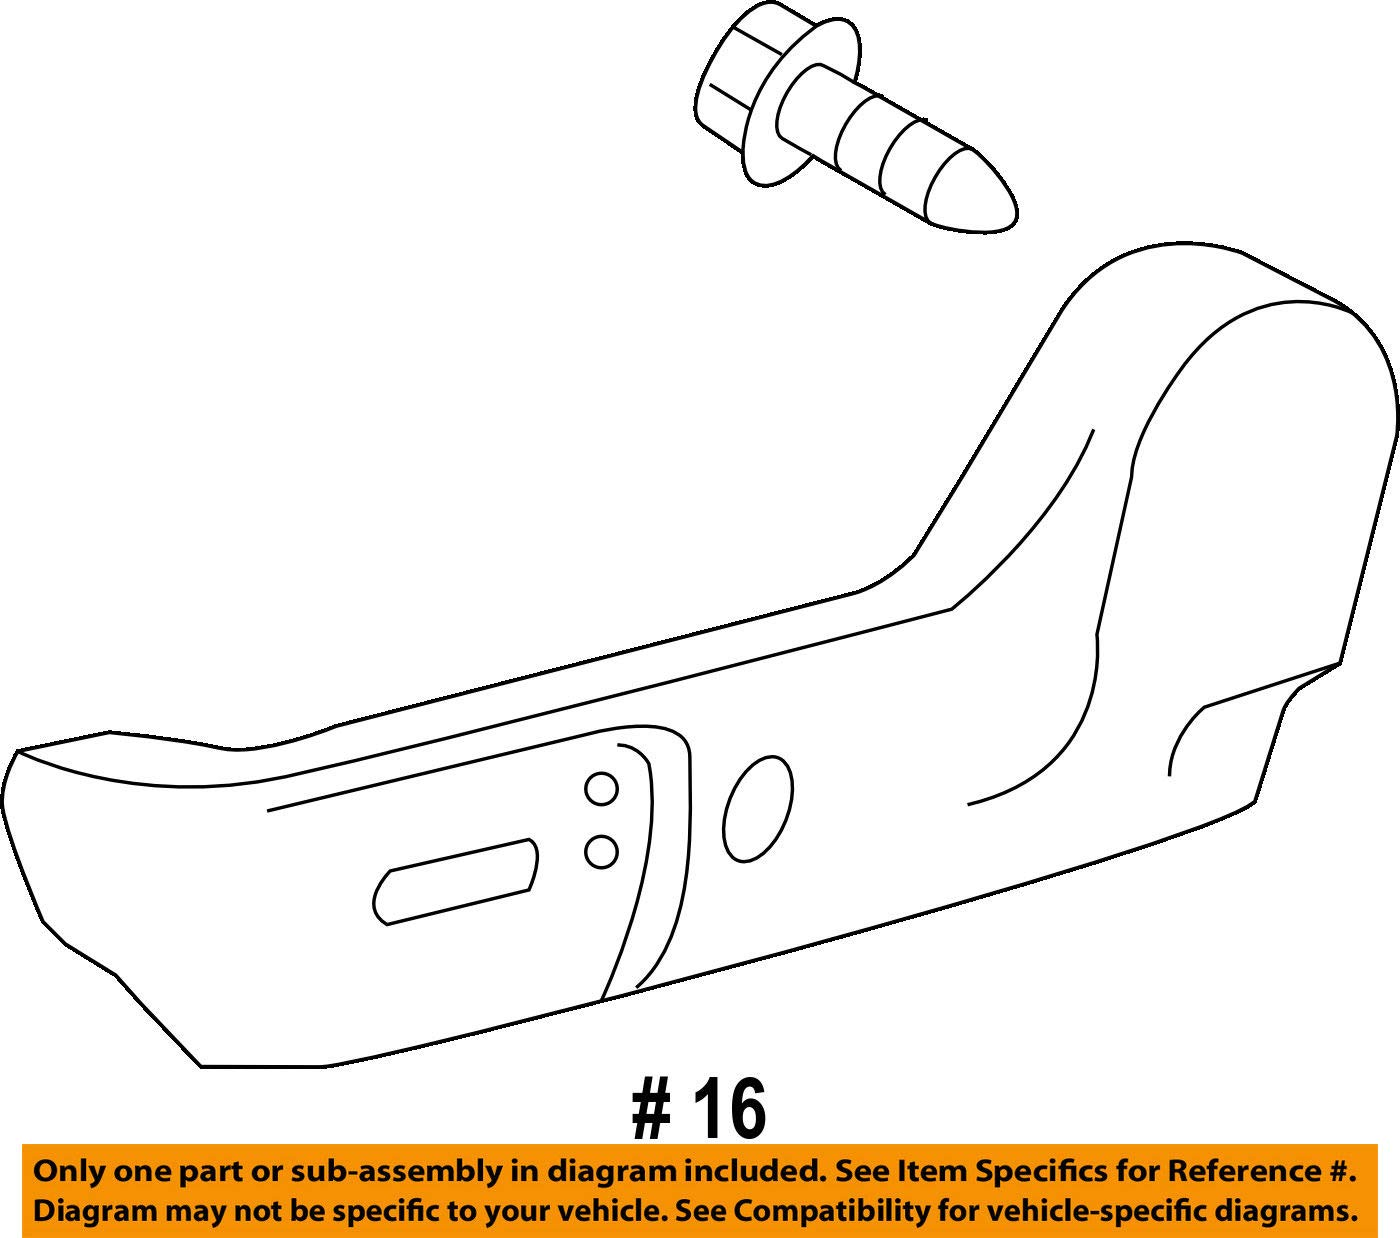 TOYOTA Genuine 71812-07060-C0 Seat Cushion Shield